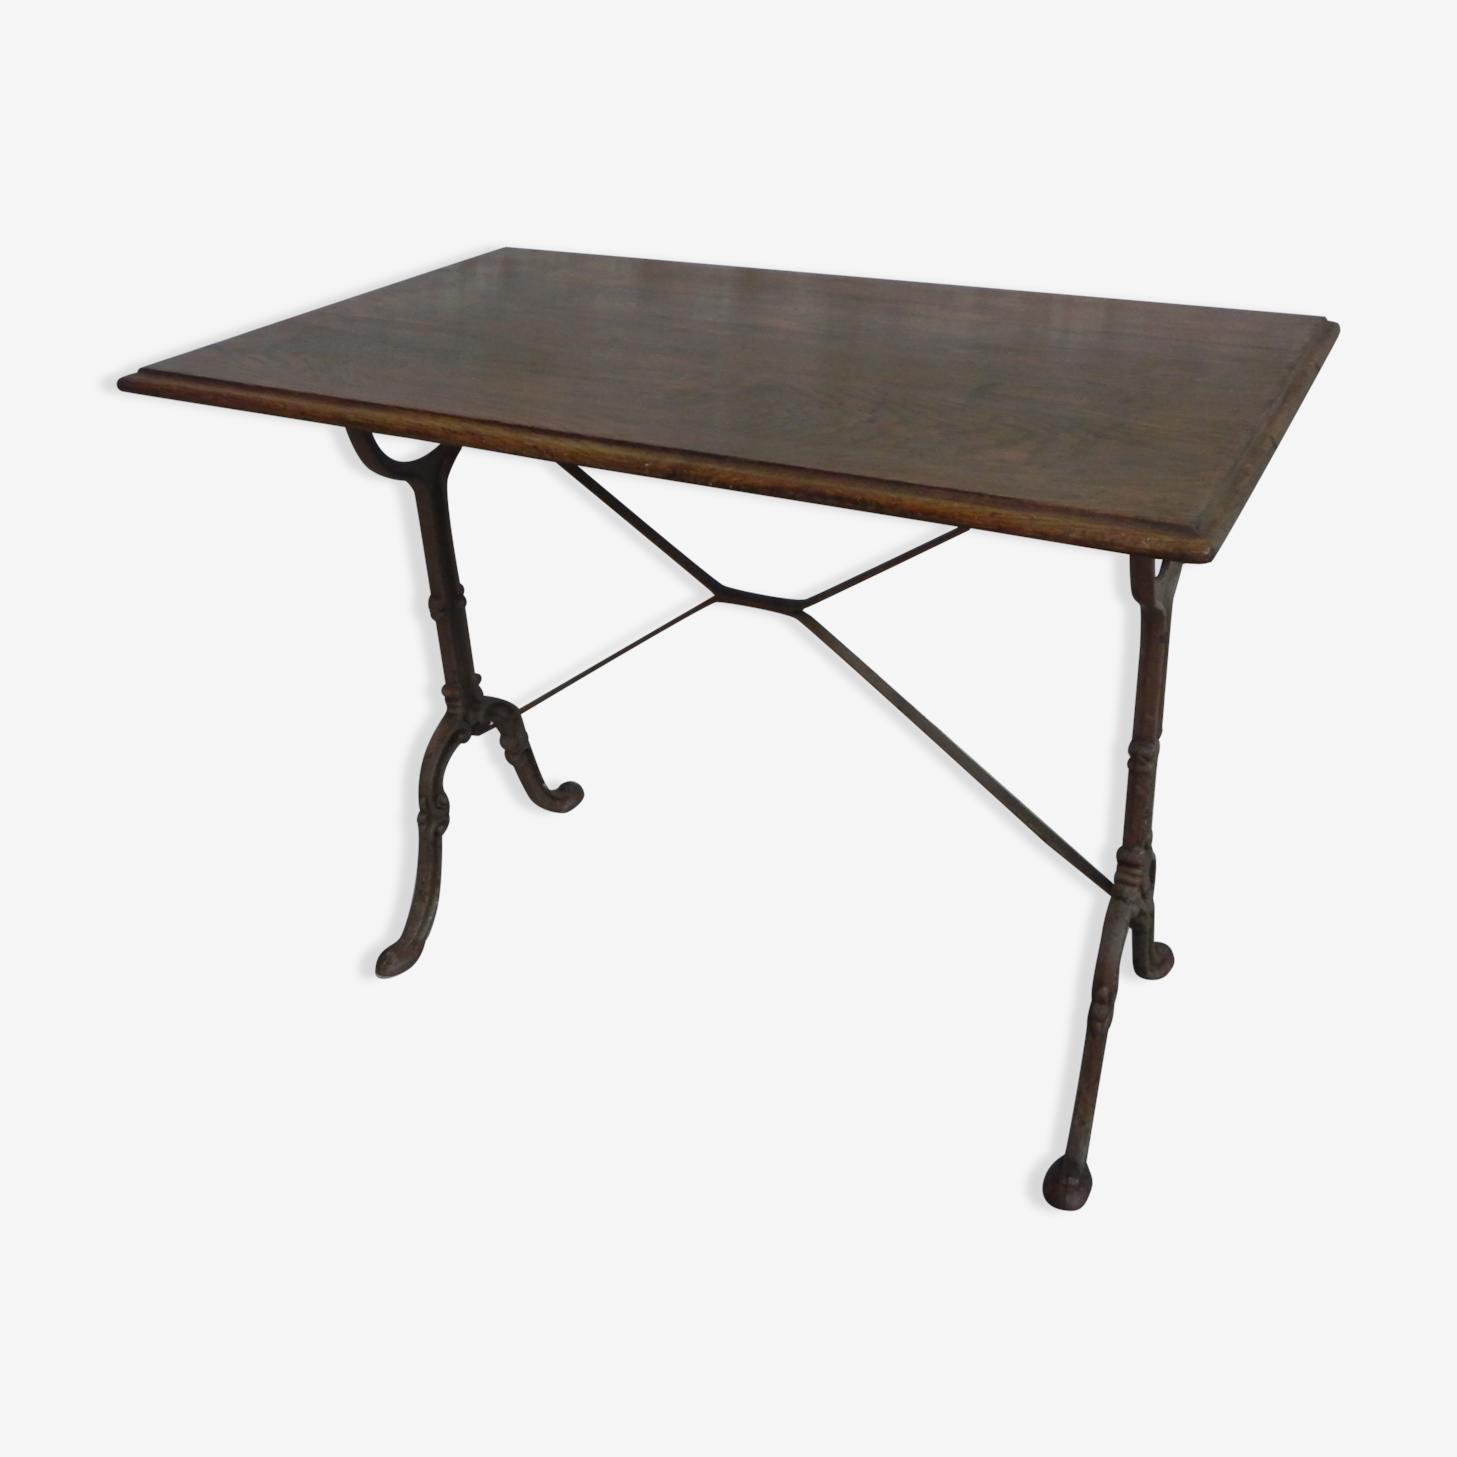 Table bistro avec chêne dessus et base en fonte